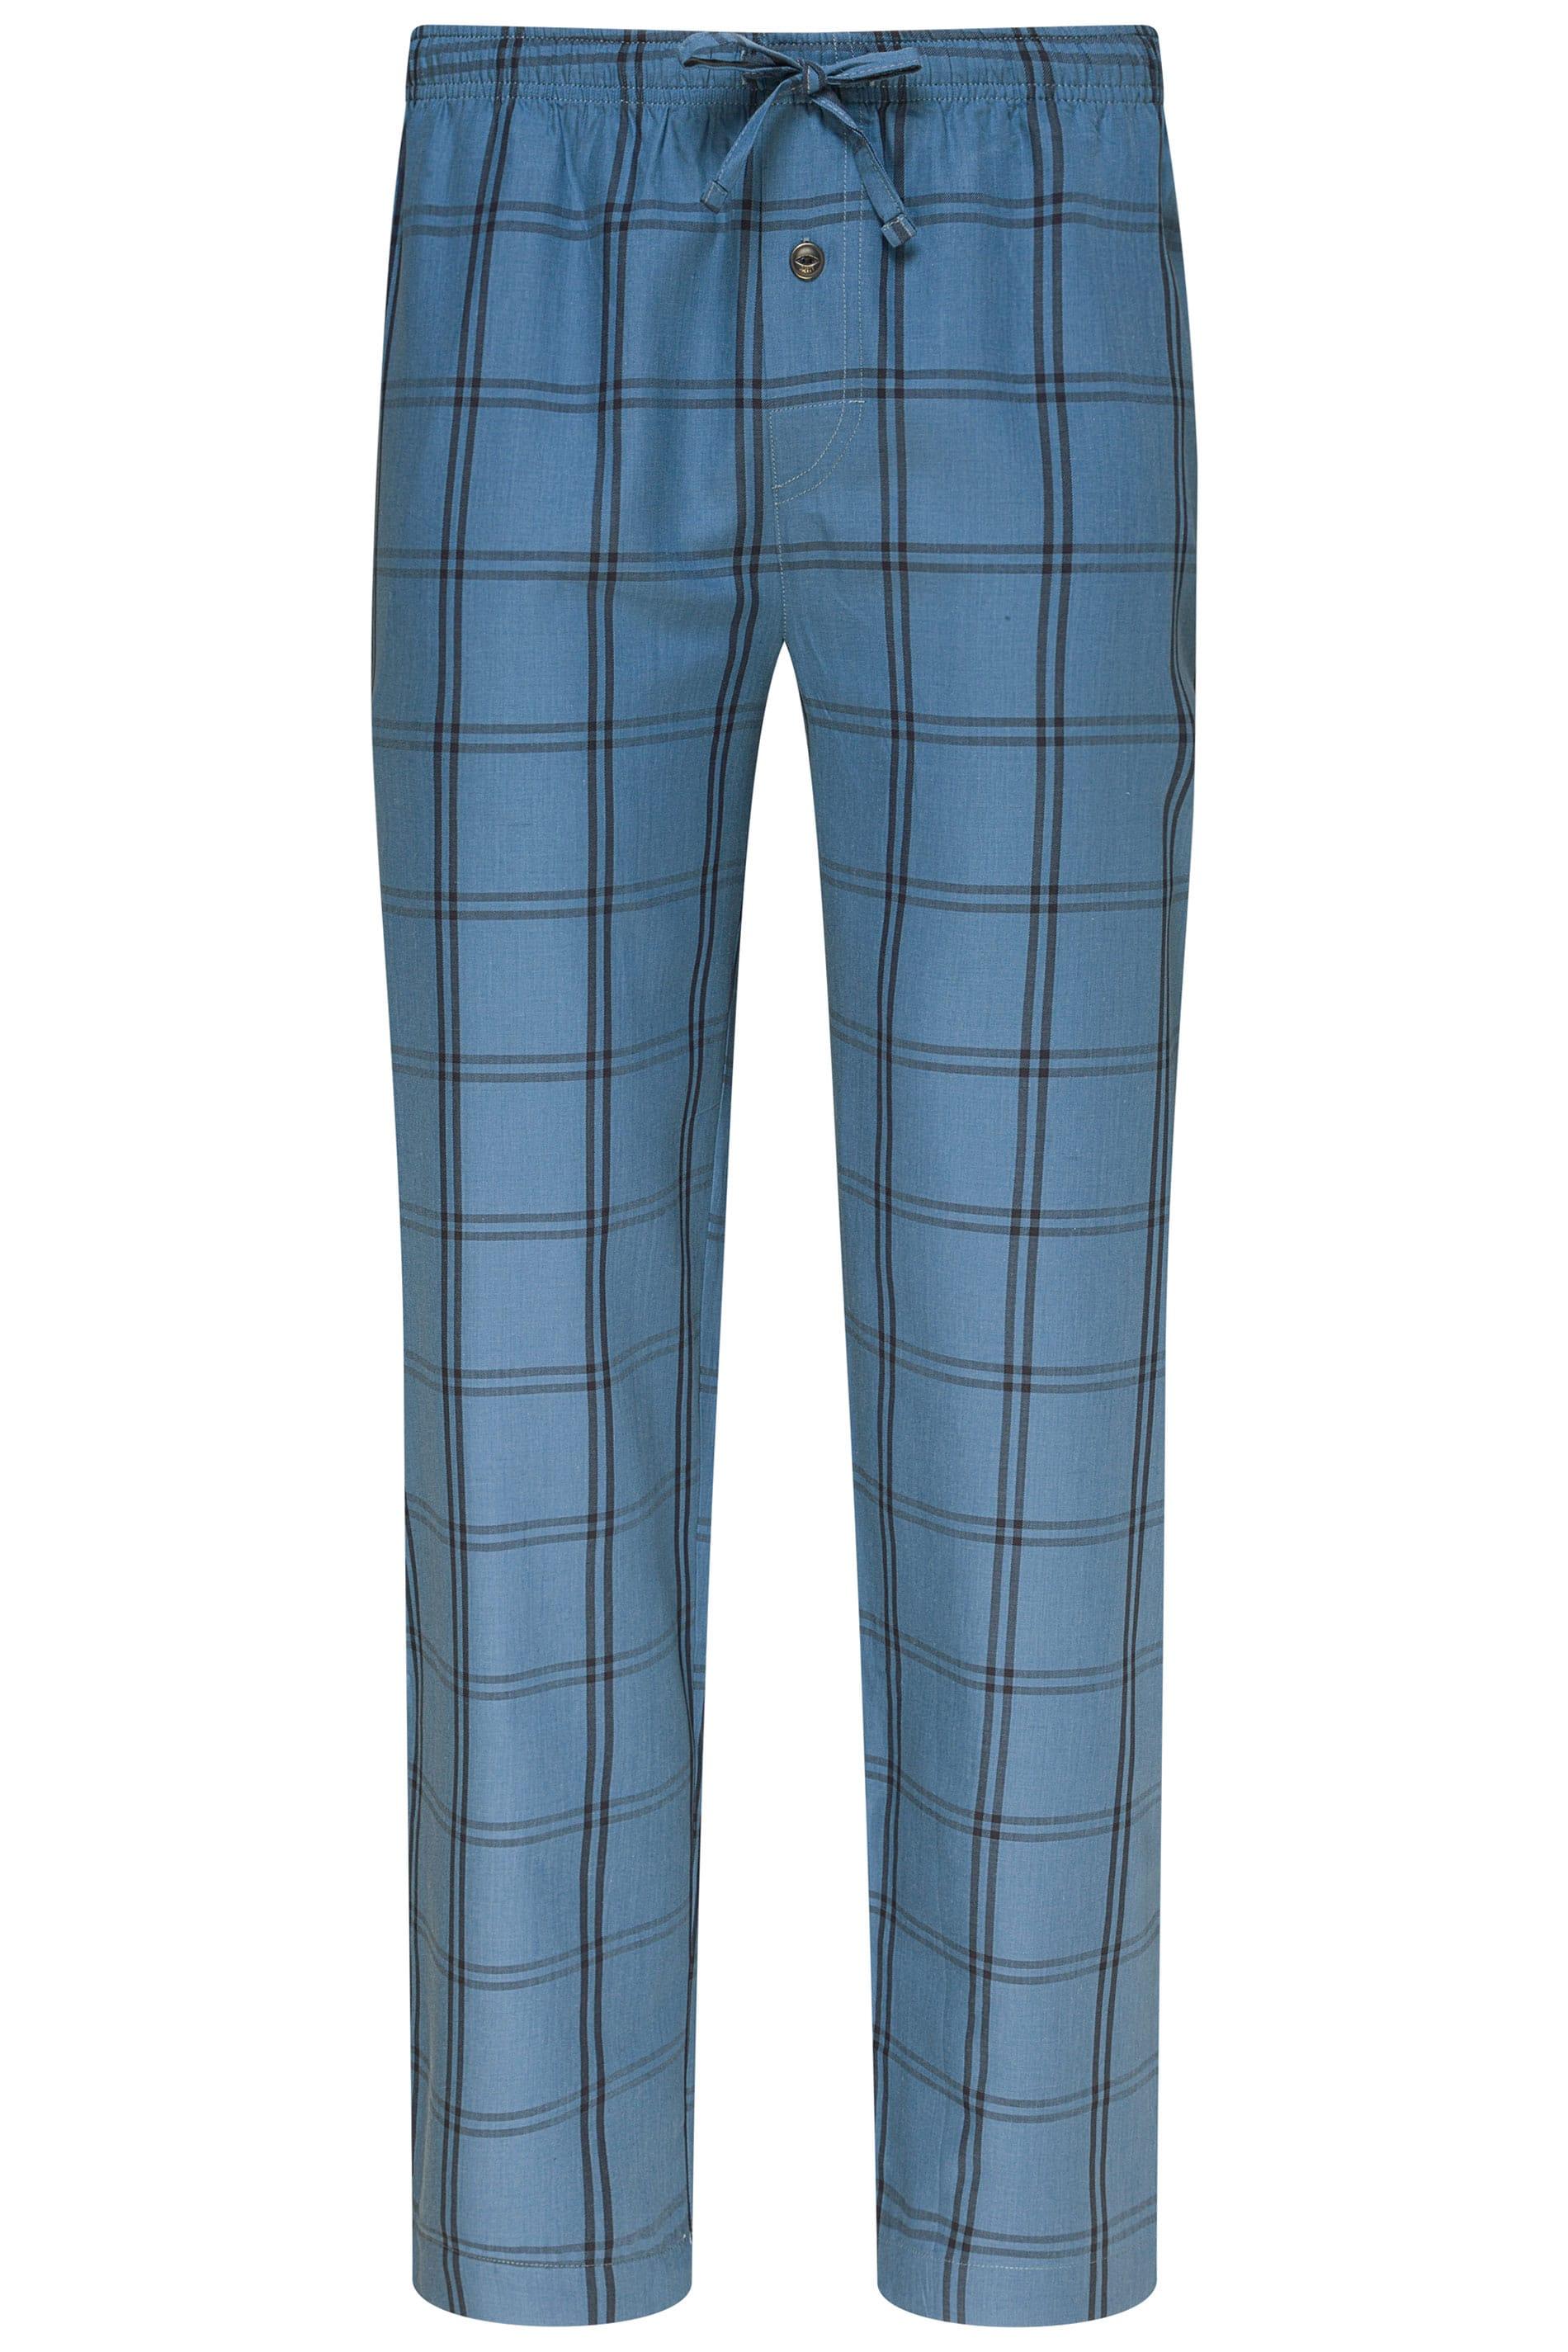 JOCKEY Blue Check Lounge Pyjama Bottoms